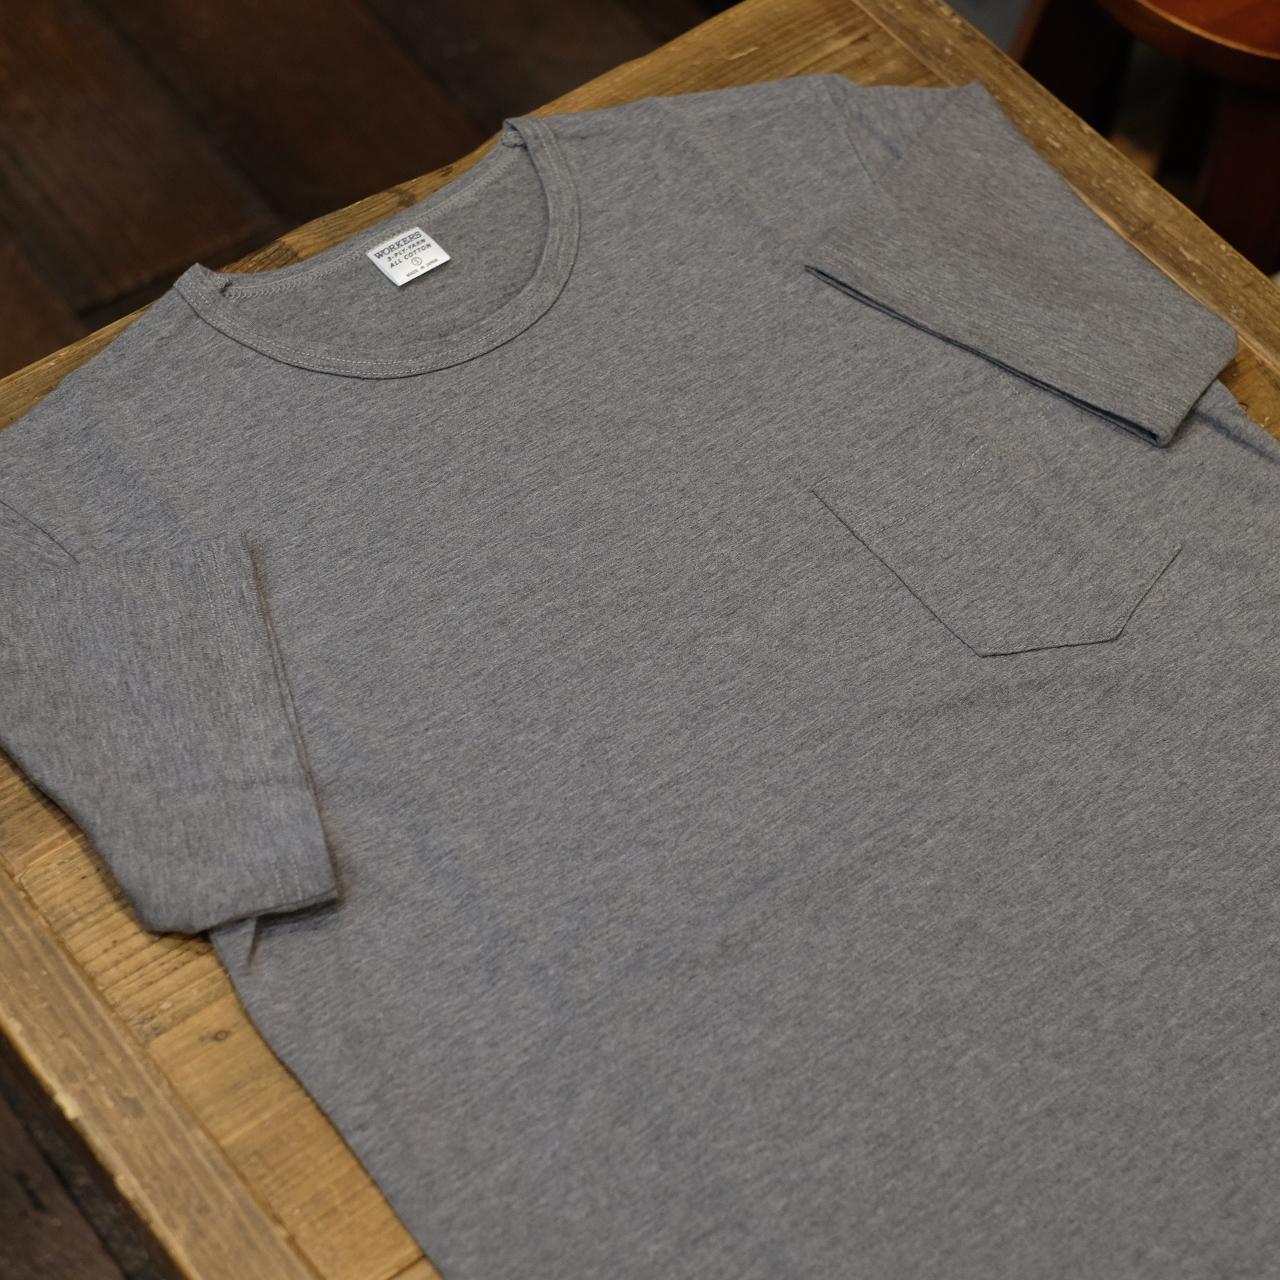 Workers(ワーカーズ) CIRCLE別注 3PLY ポケットTシャツ Cグレー